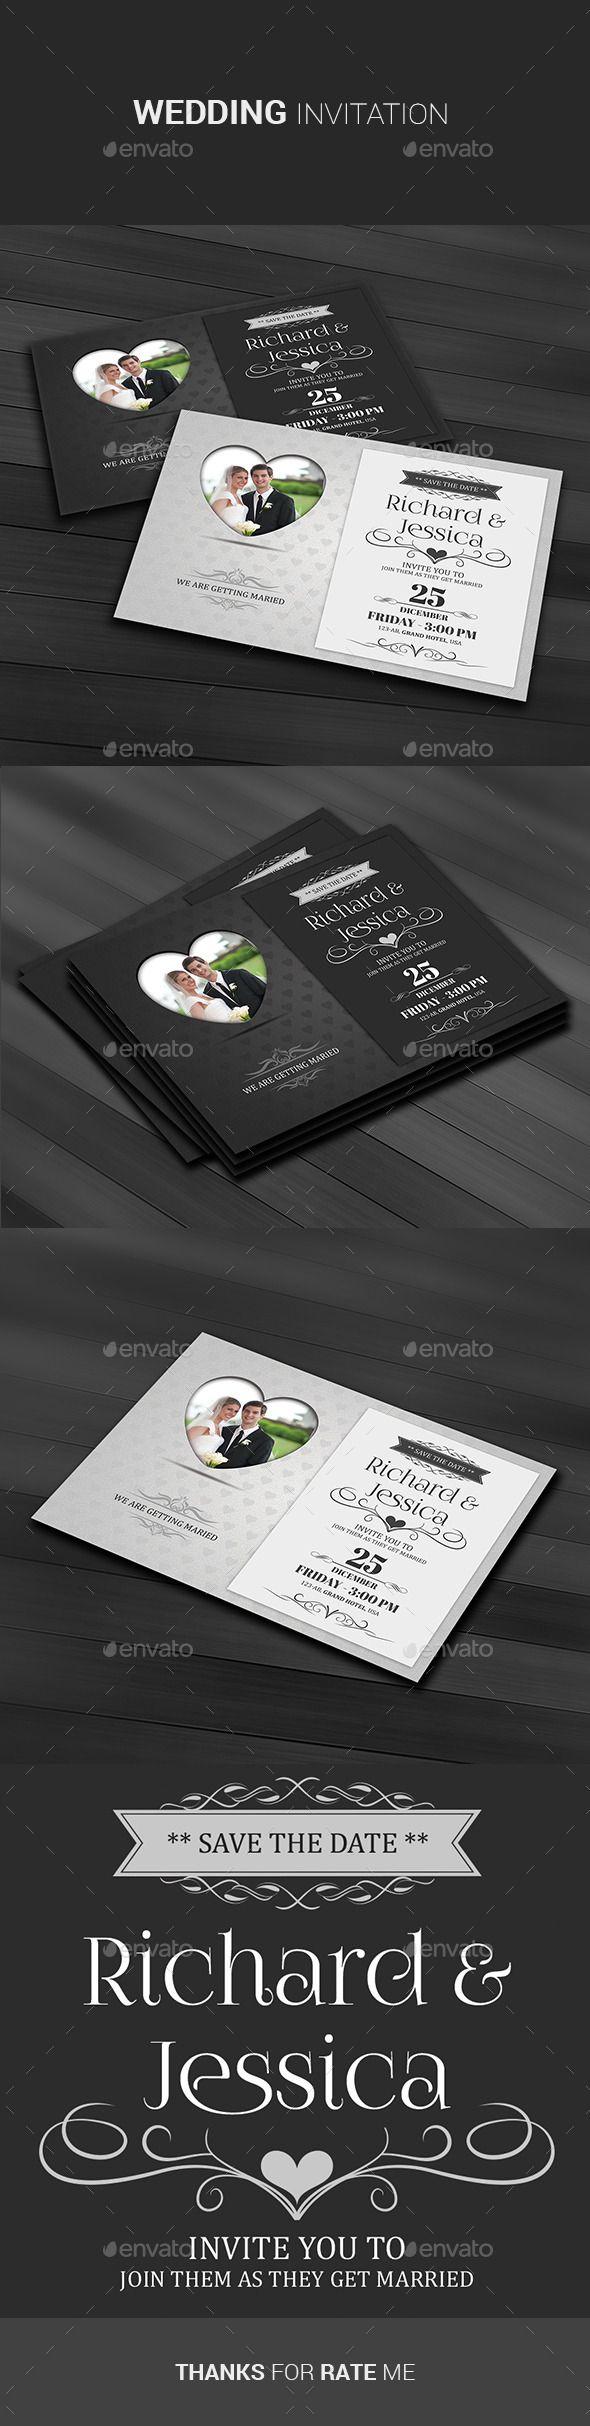 Wedding Invitation Template- Cards & Invites Print Templates Instant Download http://graphicriver.net/item/wedding-invitation/11095277?ref=themedevisers